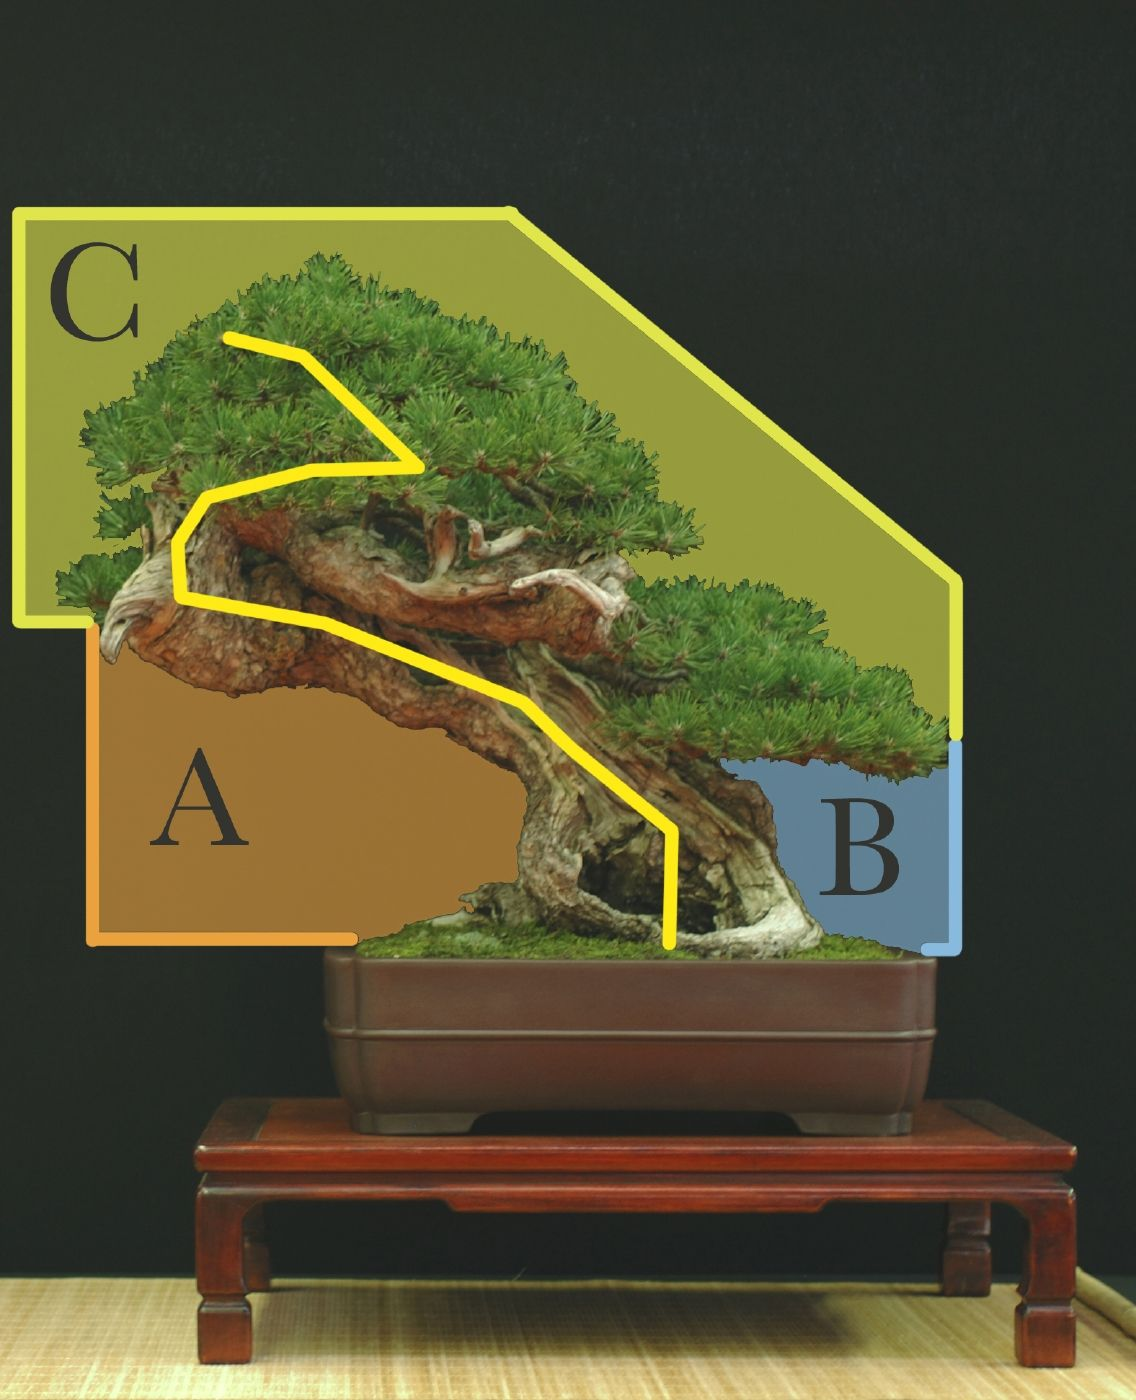 styles esth tique et formation des bonsa le forum des. Black Bedroom Furniture Sets. Home Design Ideas